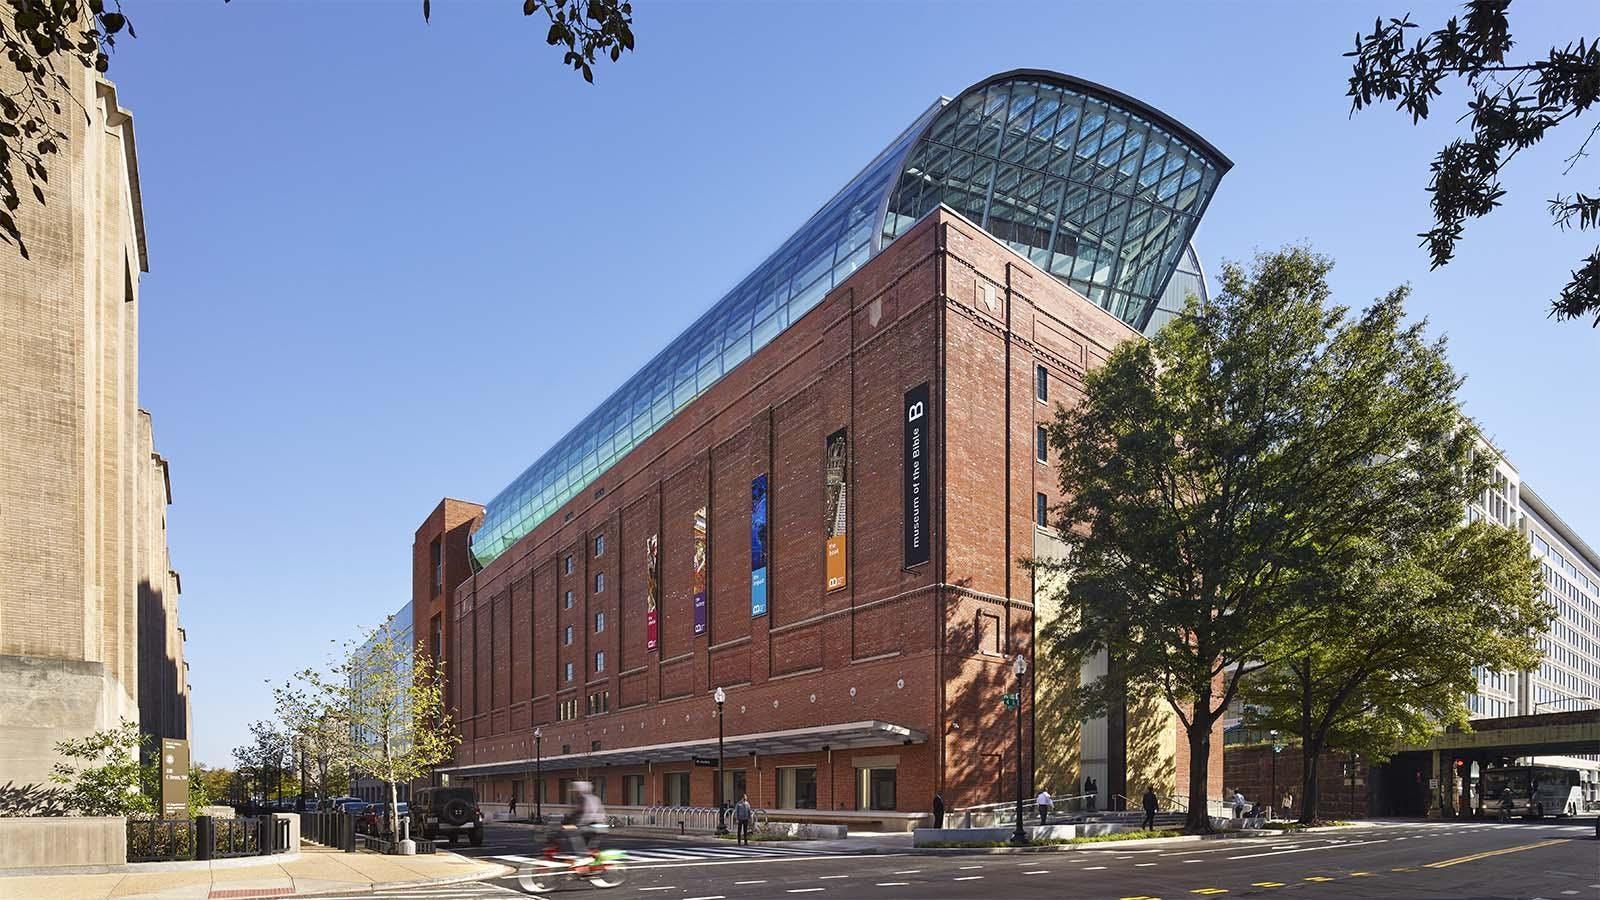 Museum of the Bible - Washington, D.C.